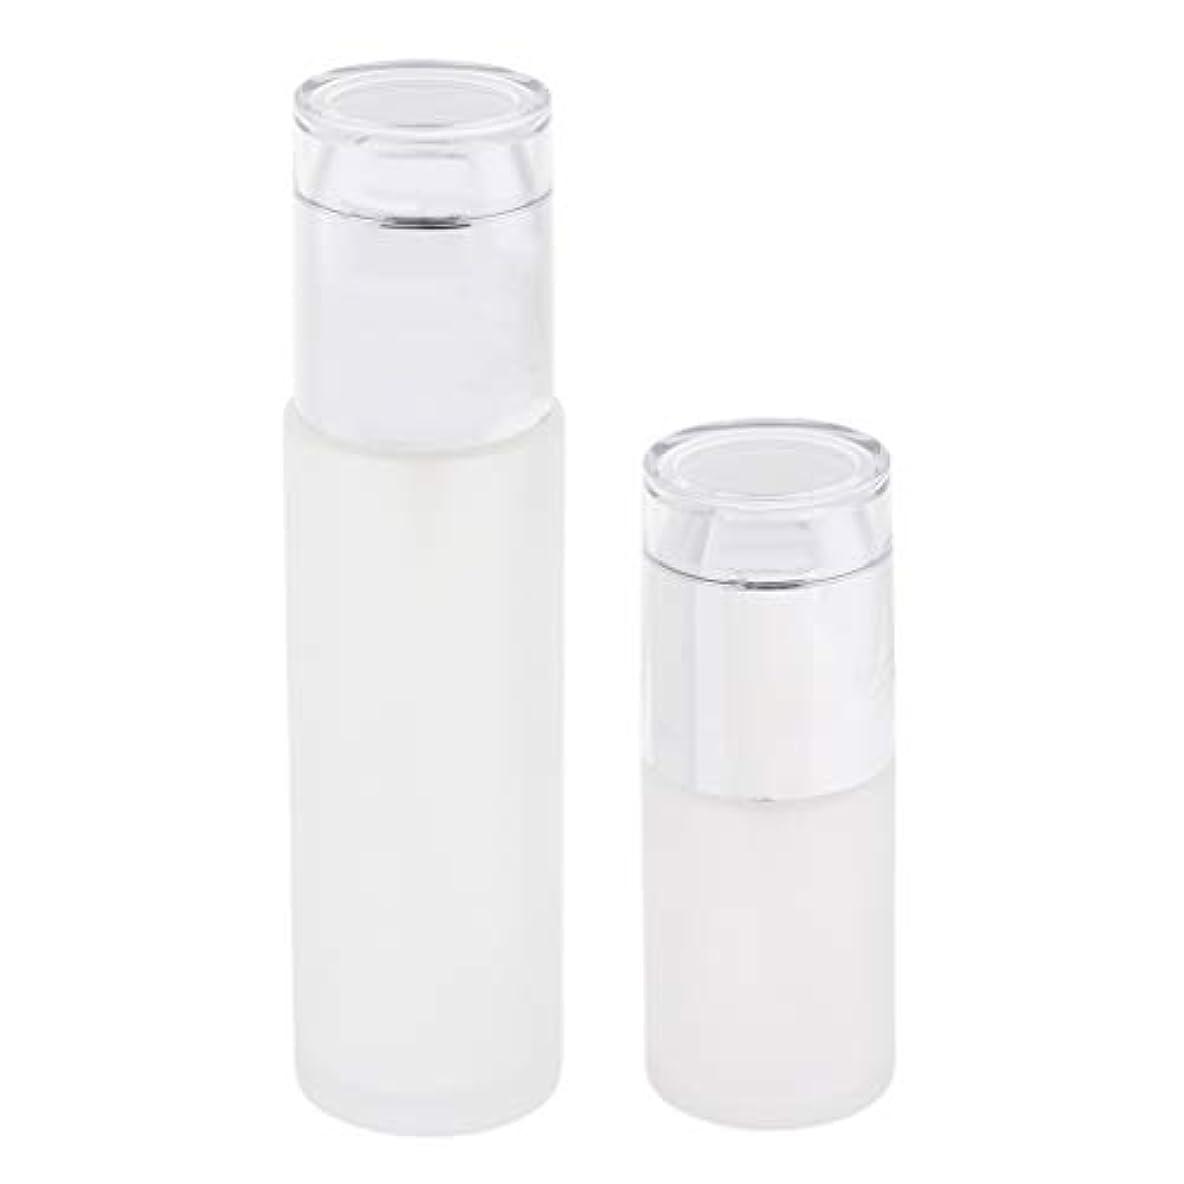 Baoblaze 2個 化粧ボトル ガラス コスメ用詰替え容器 ポンプボトル 3色選べ - 銀